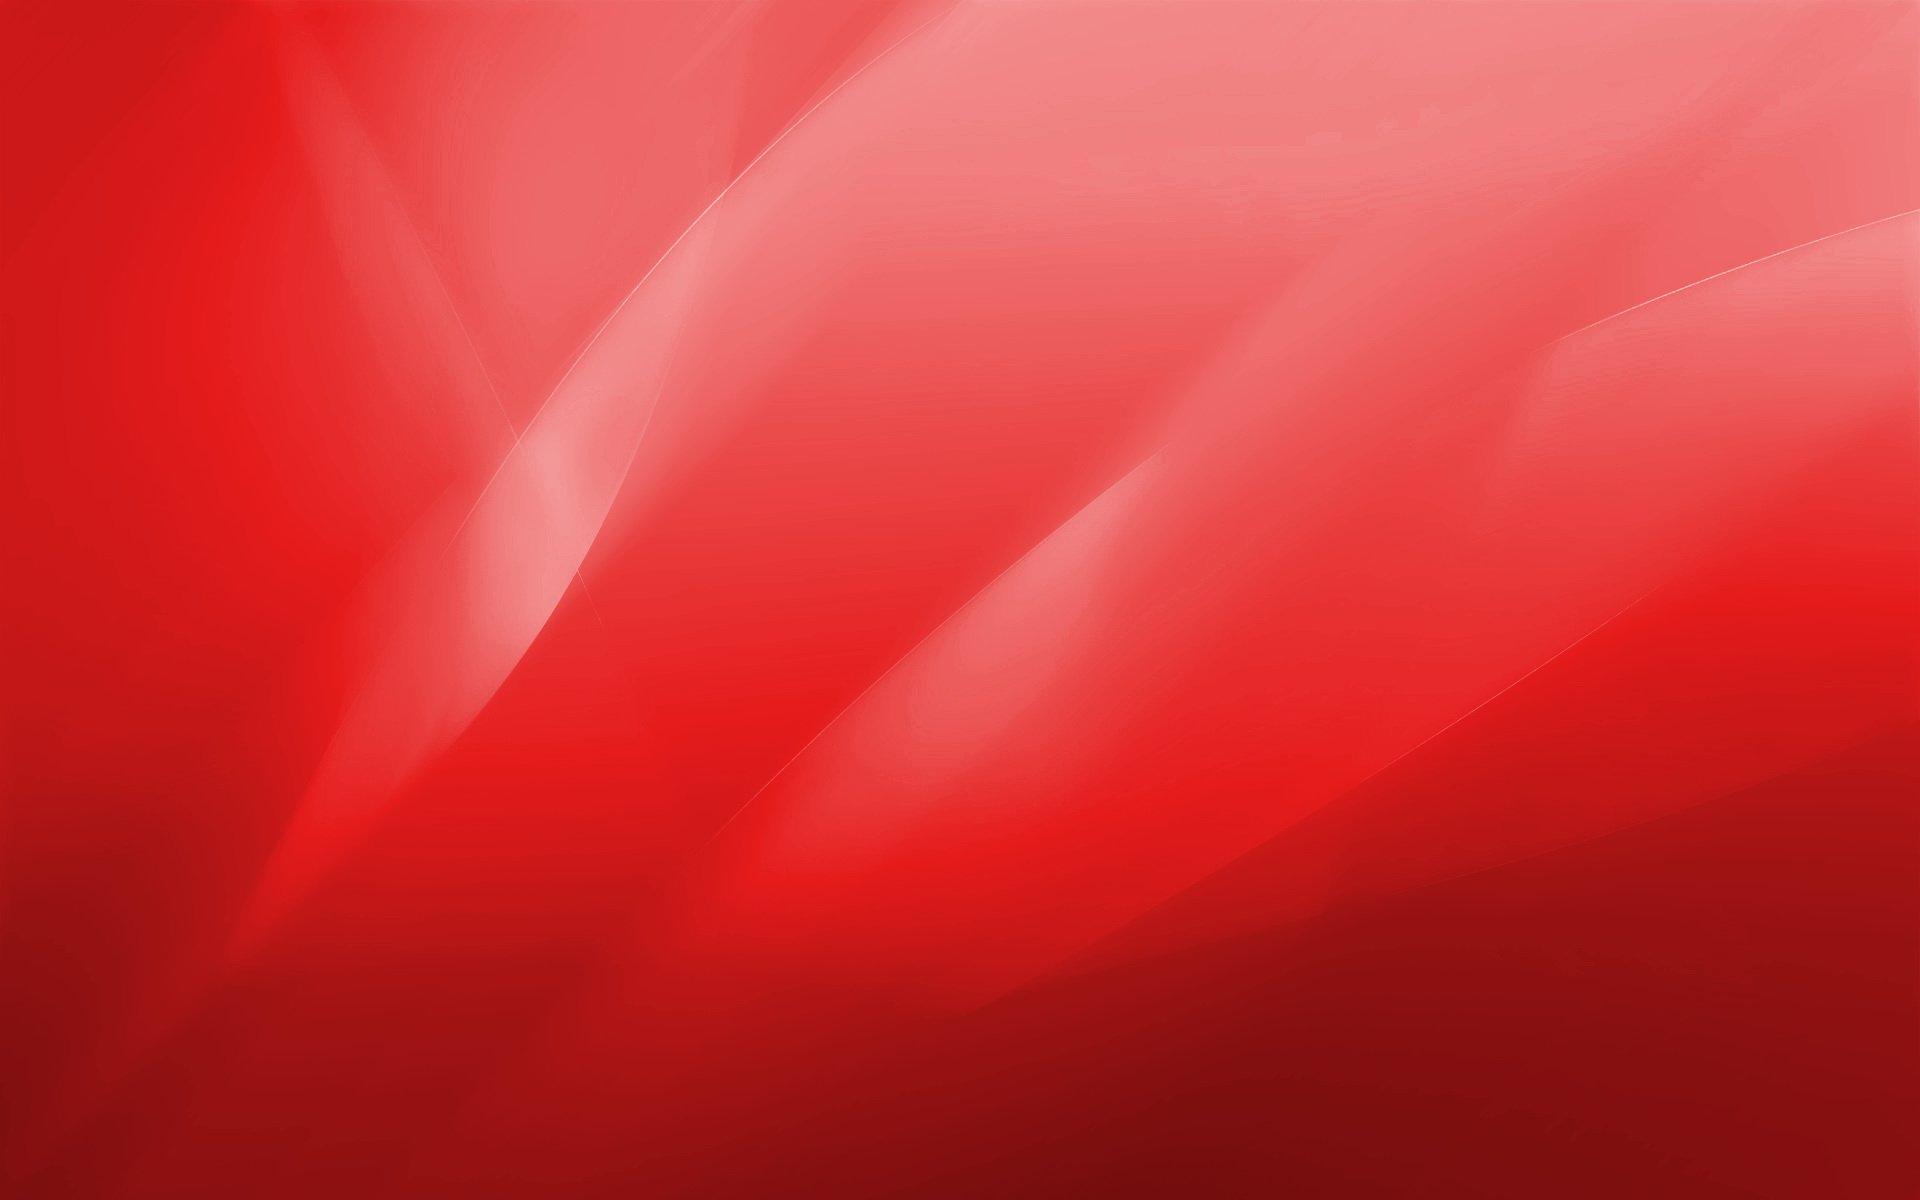 red wallpaper 11 1920x1200